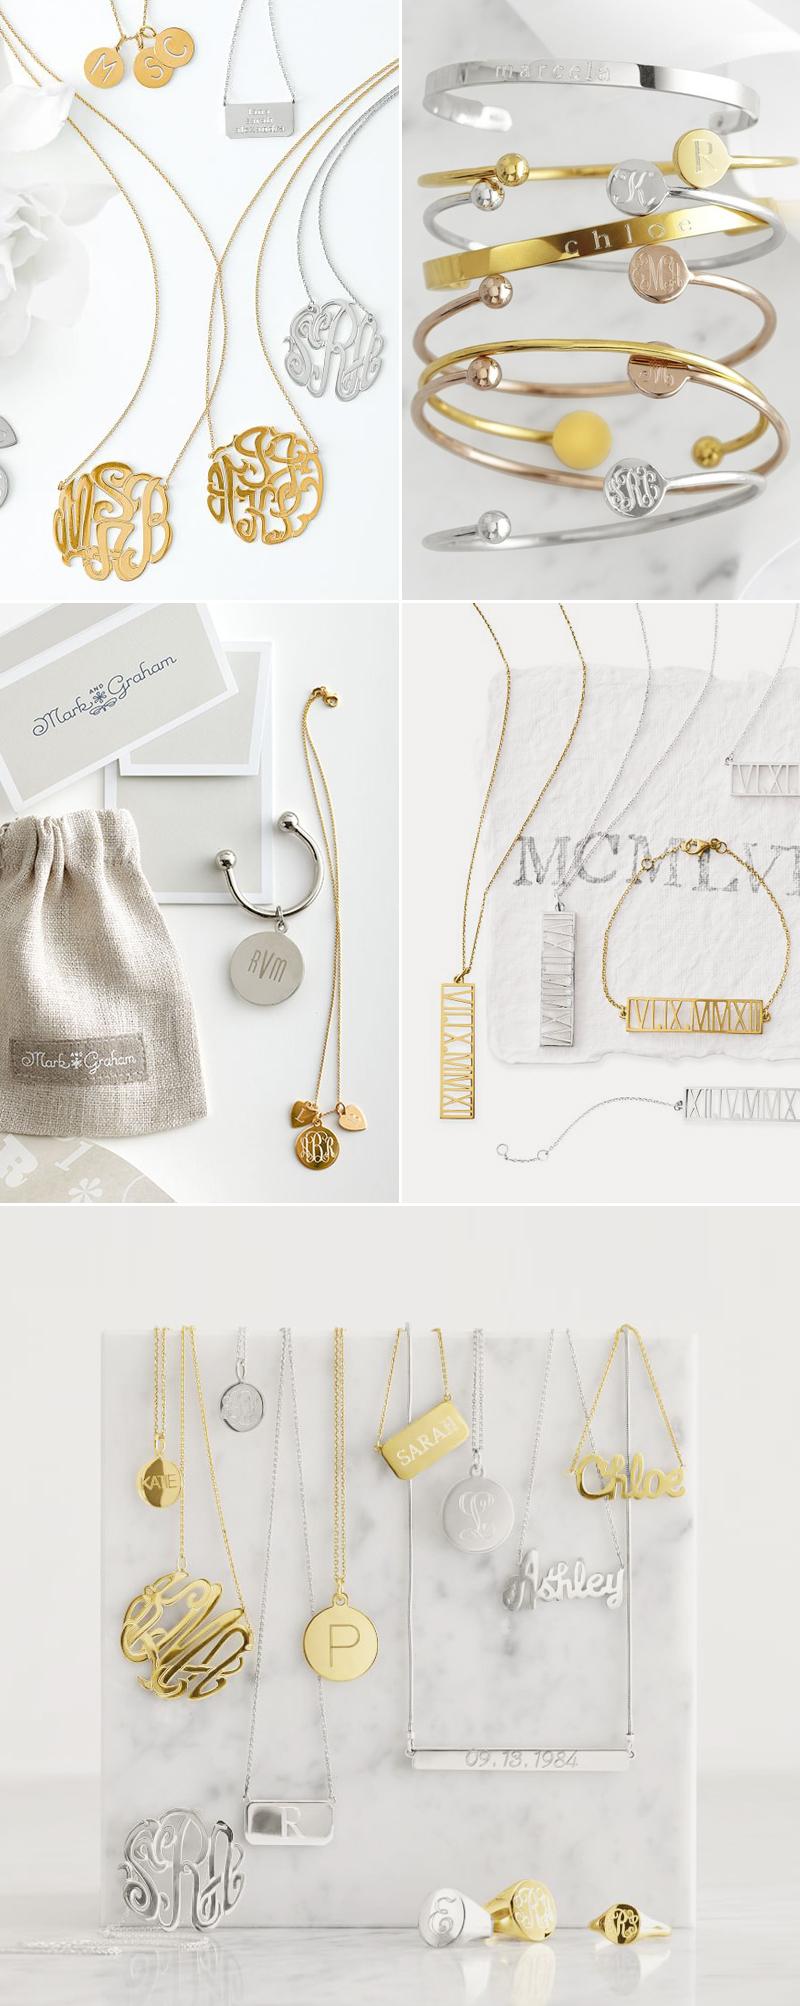 jewelry04-markandgraham